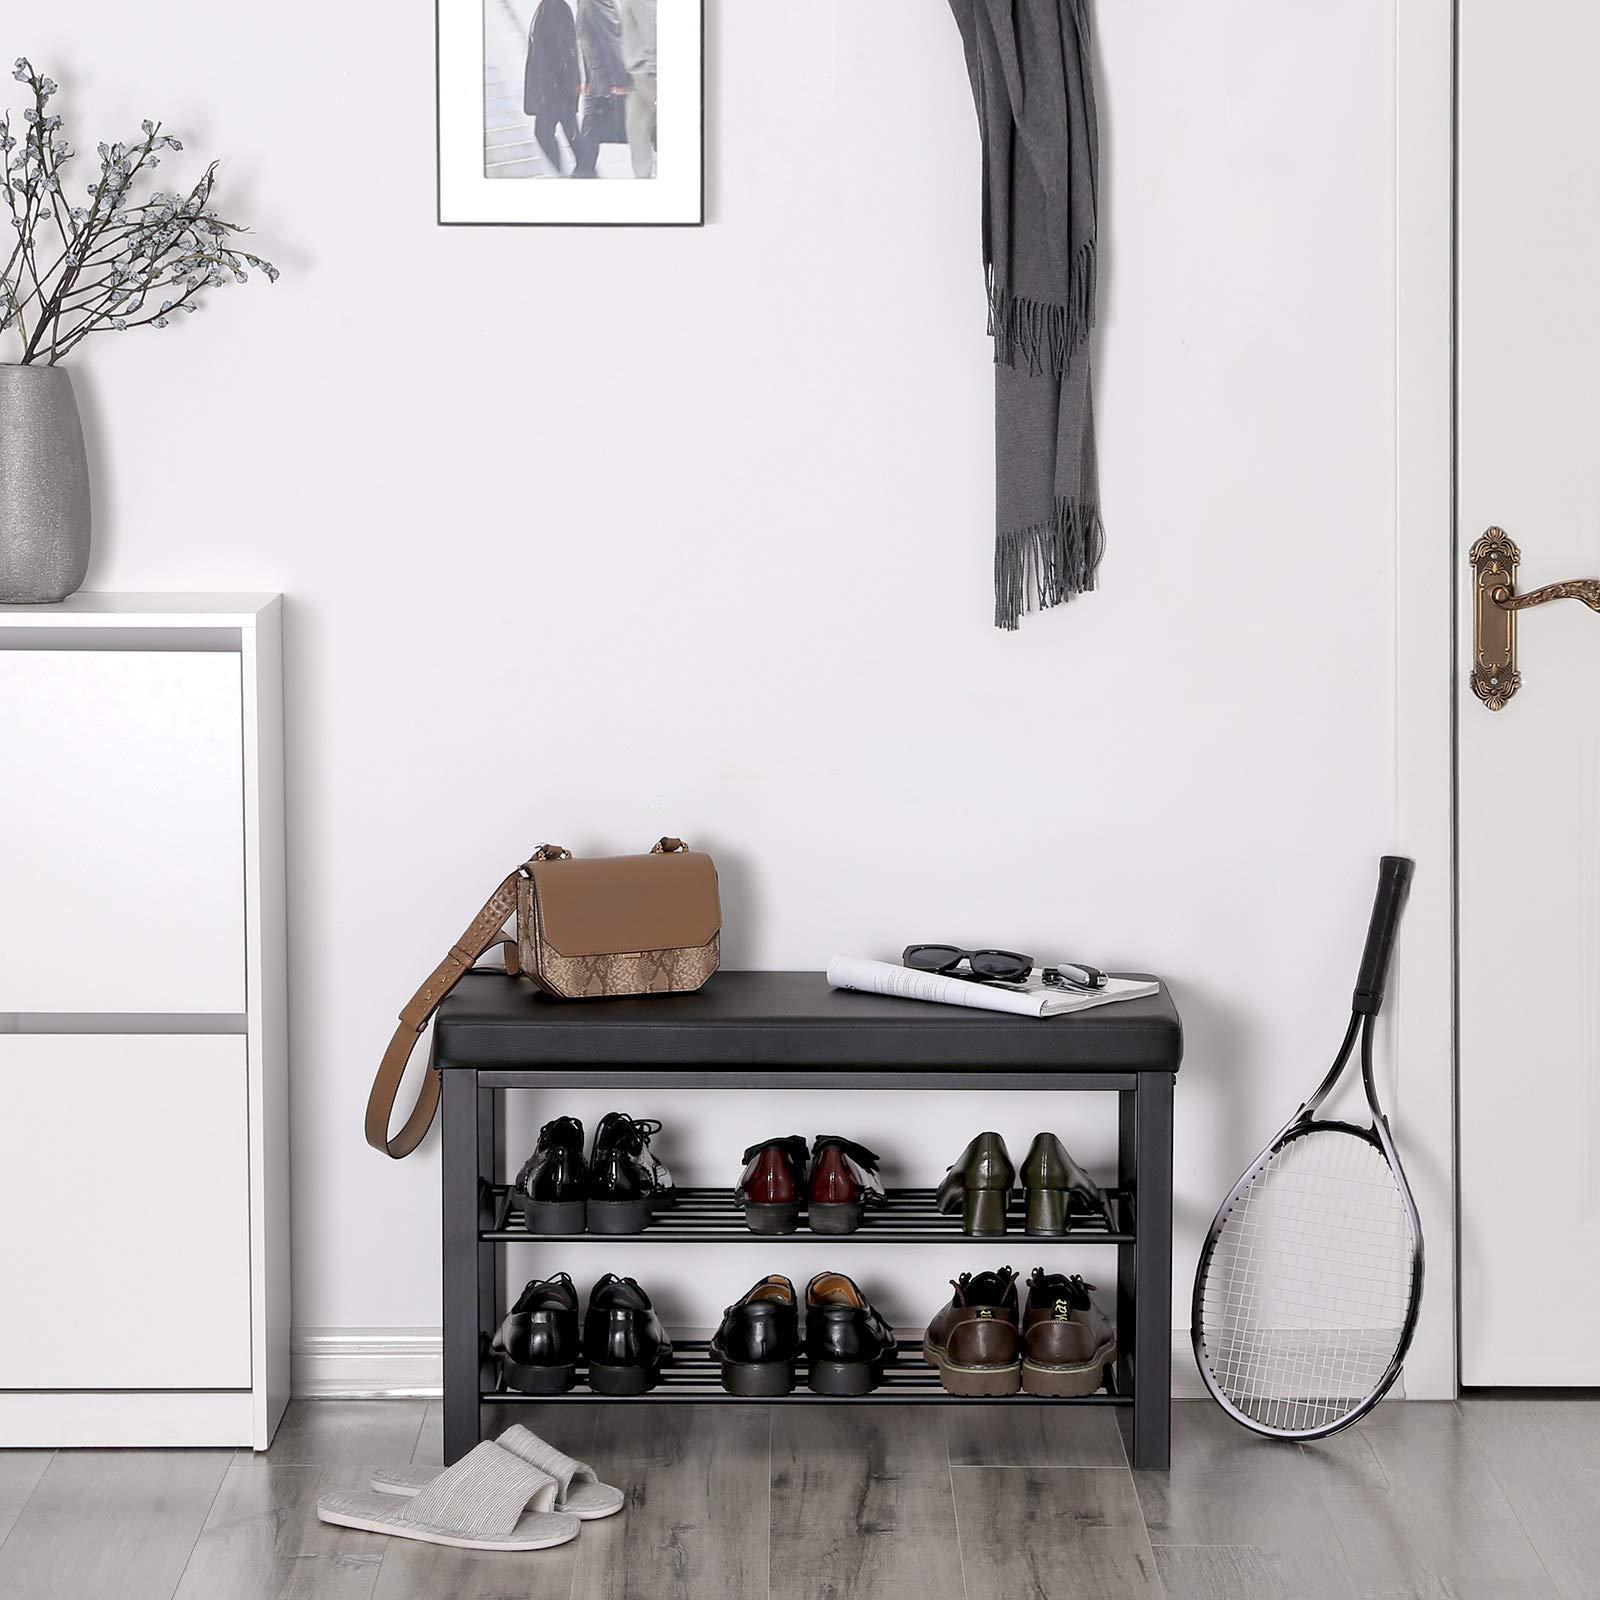 SONGMICS Metal Shoe Bench Entryway Shoe Storage Organizer Faux Leather Top